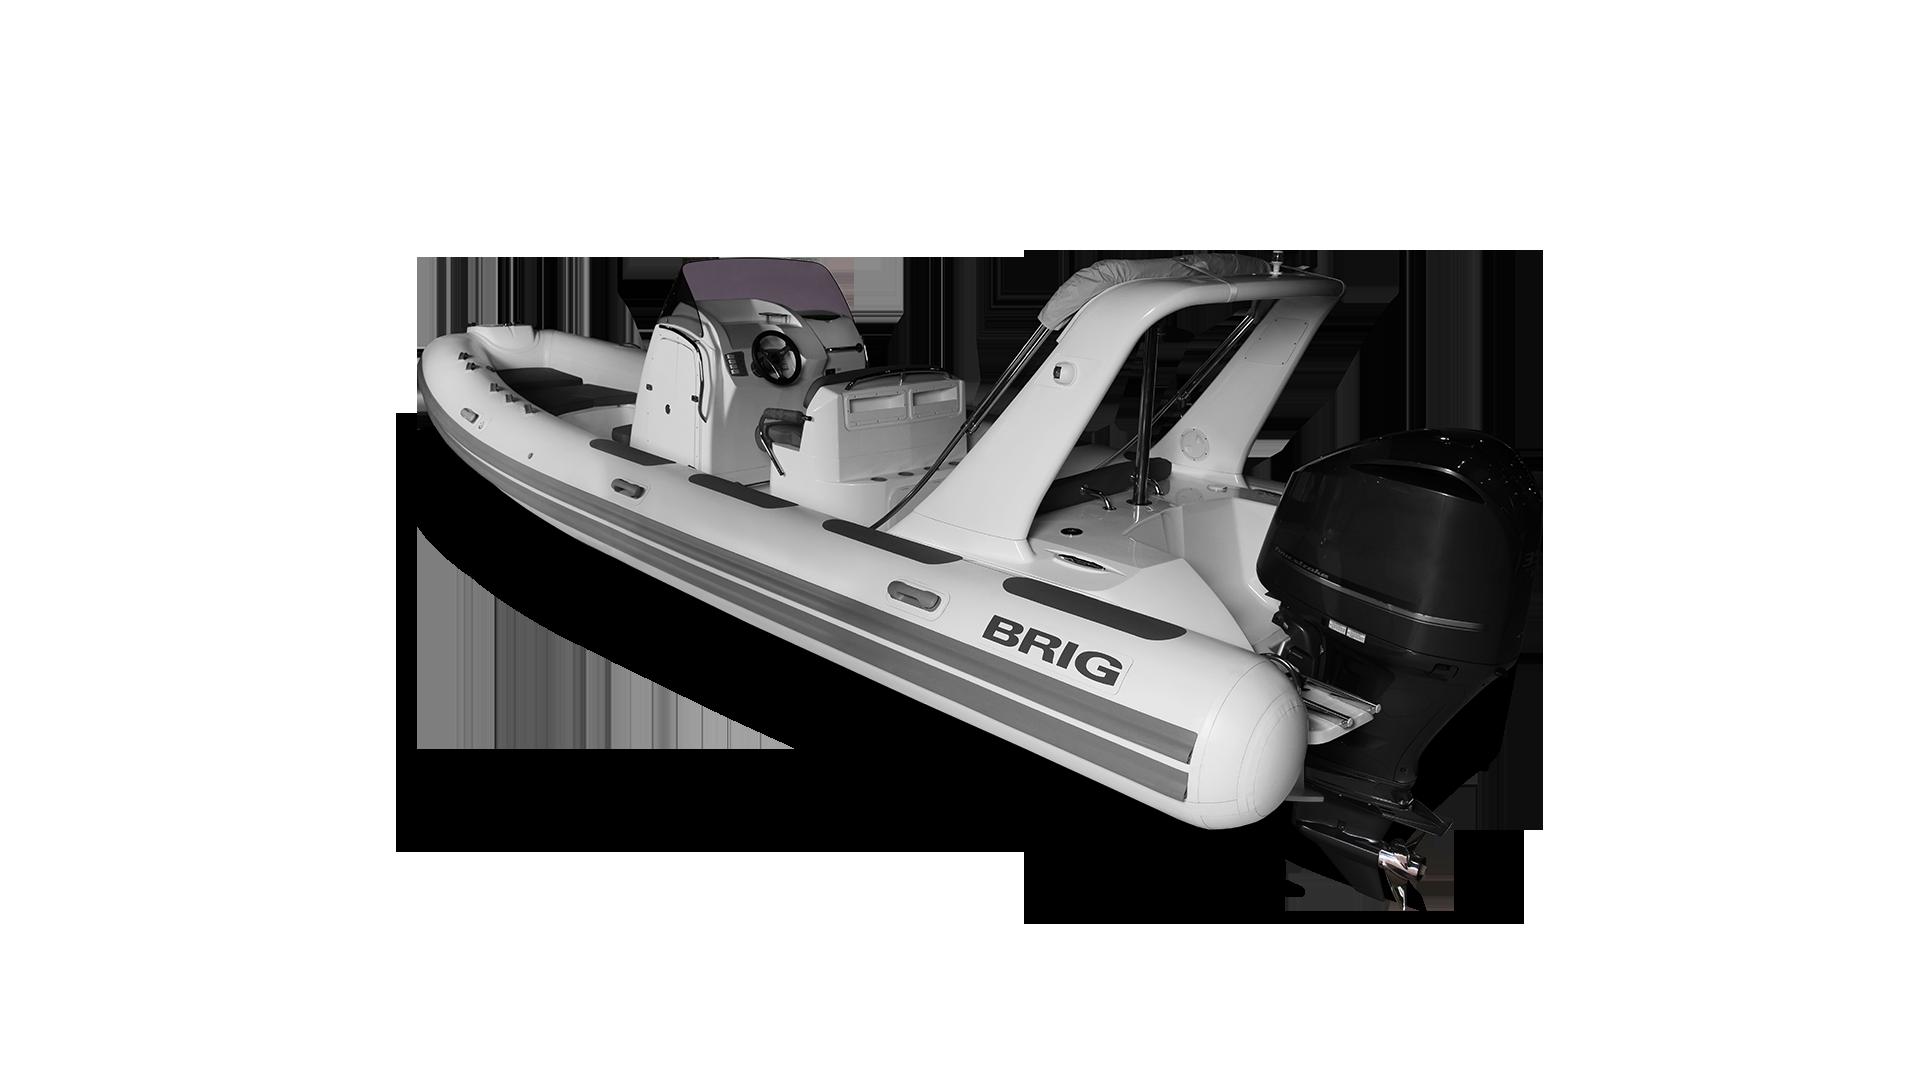 Eagle 780 Rigid Inflatable Boat